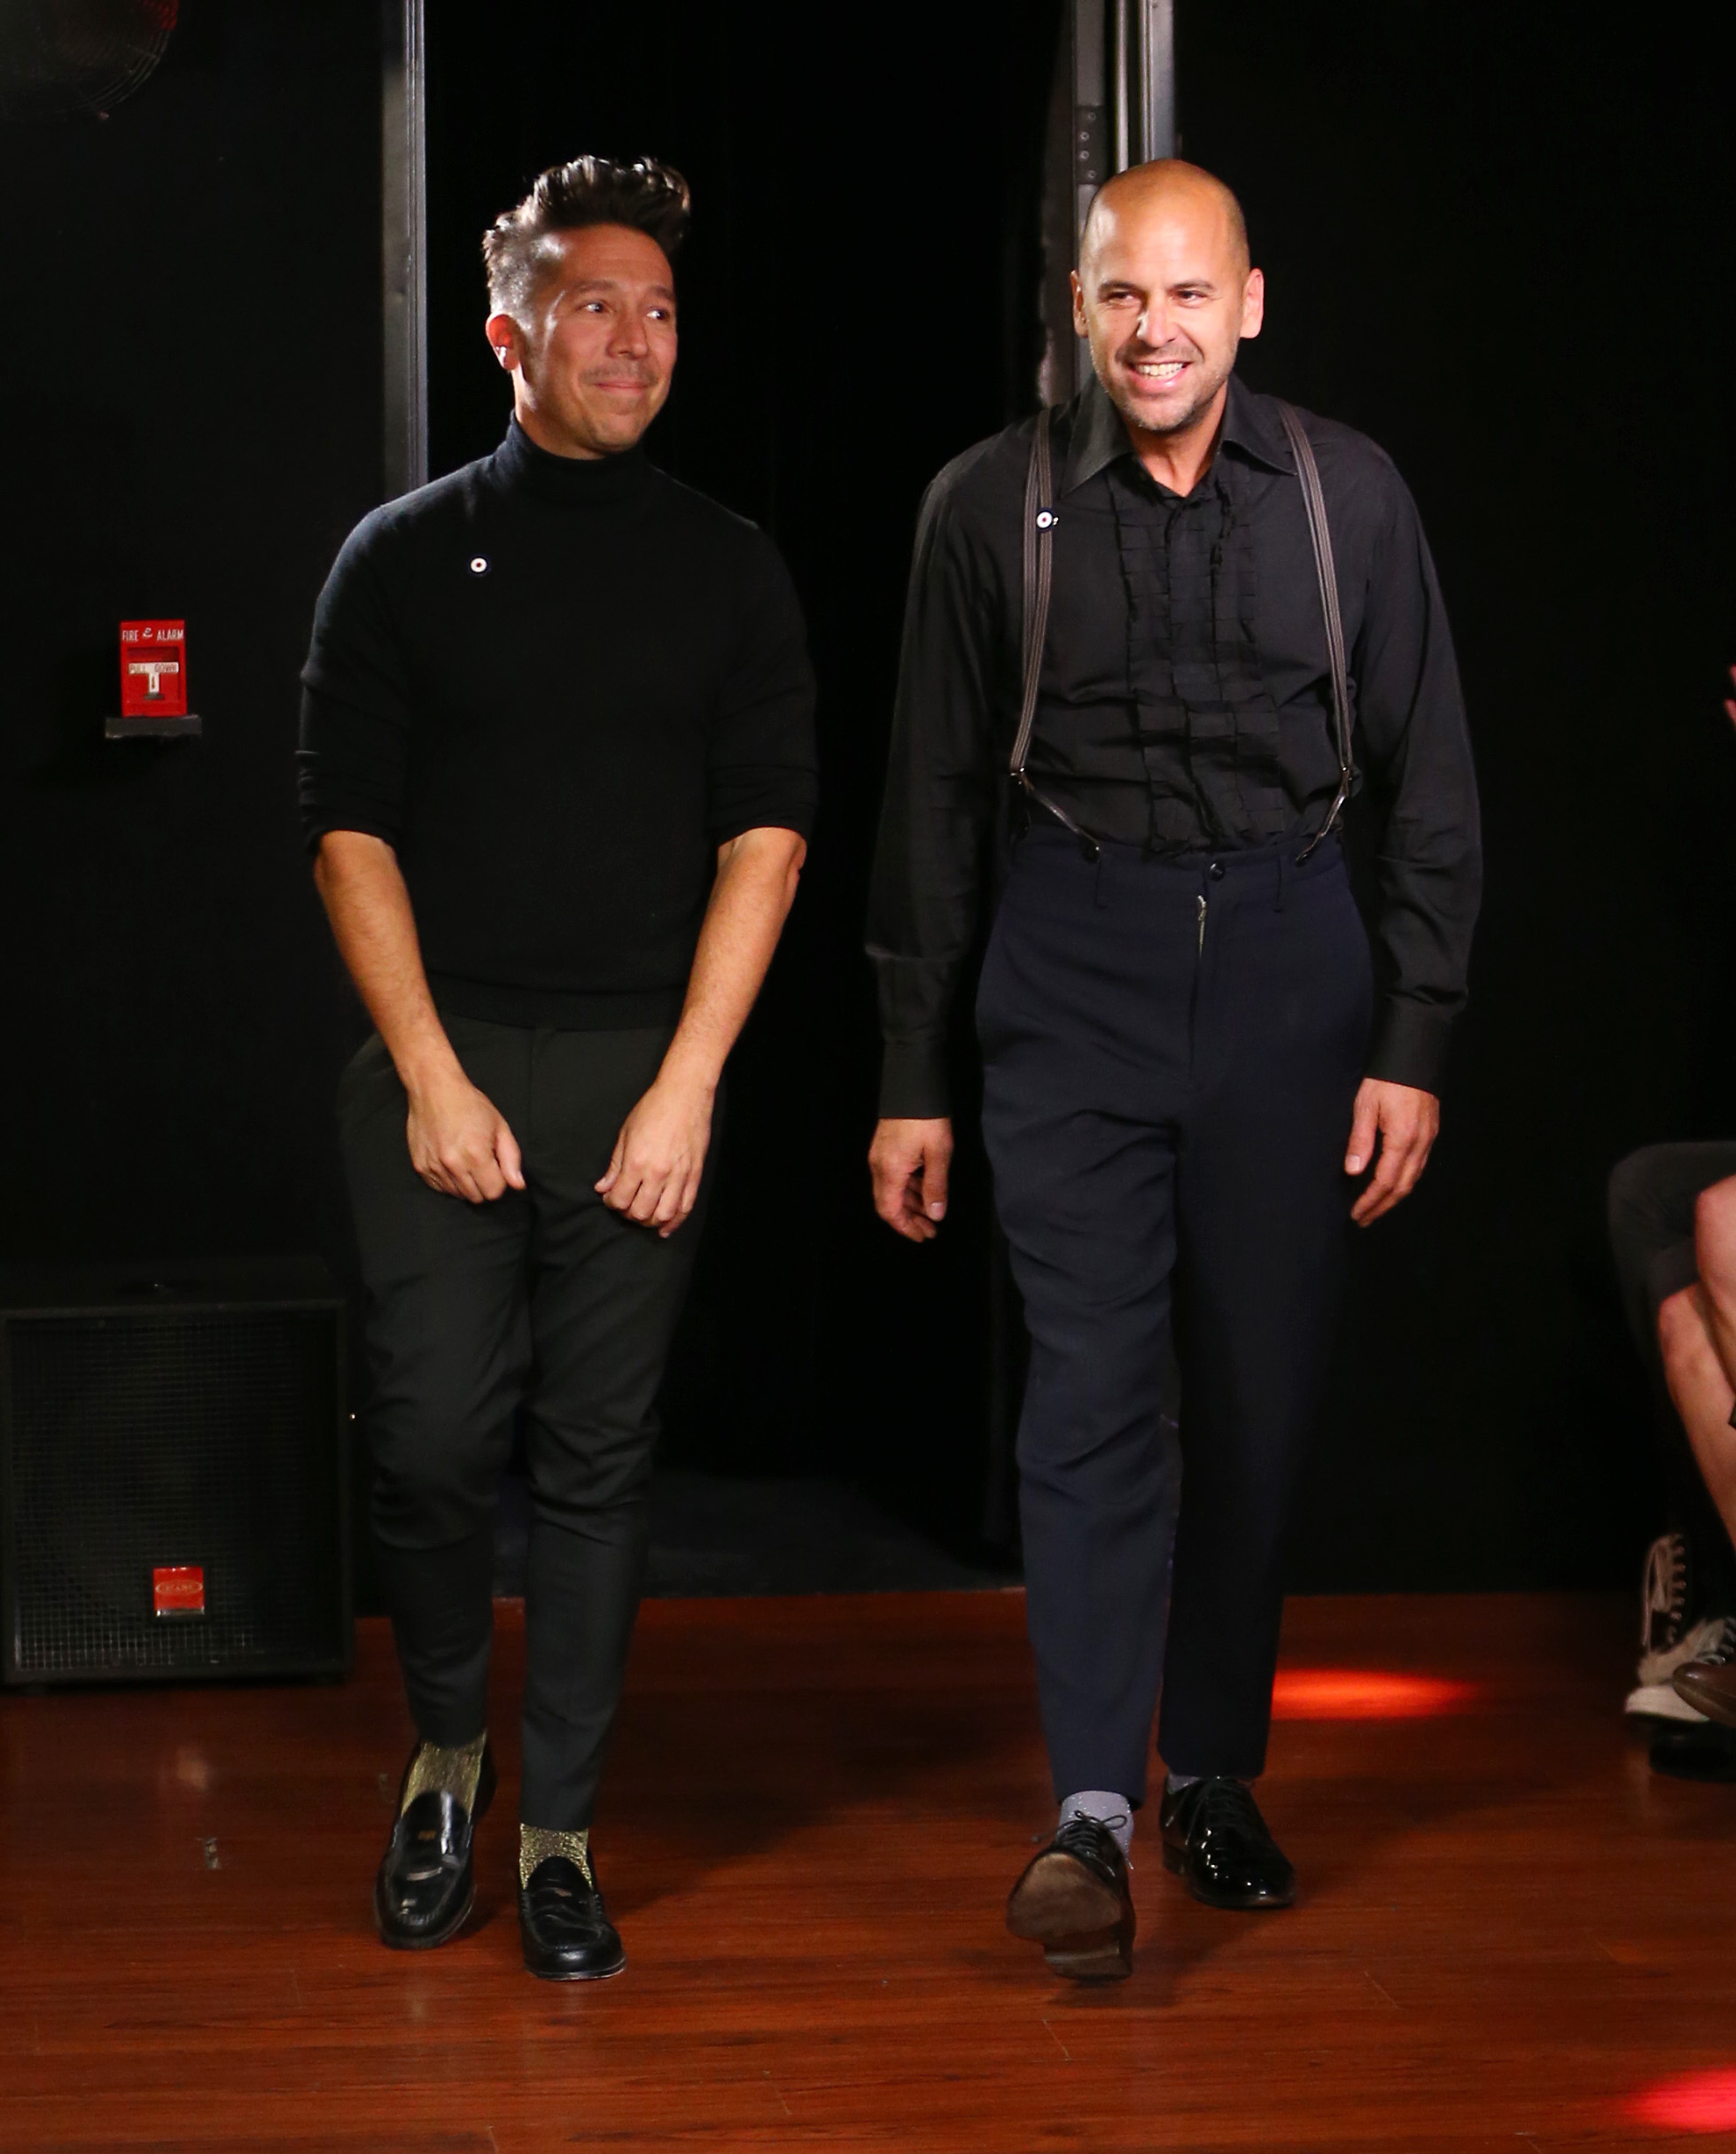 Brian Wolk and Claude Morais  at their resort 2017 show.